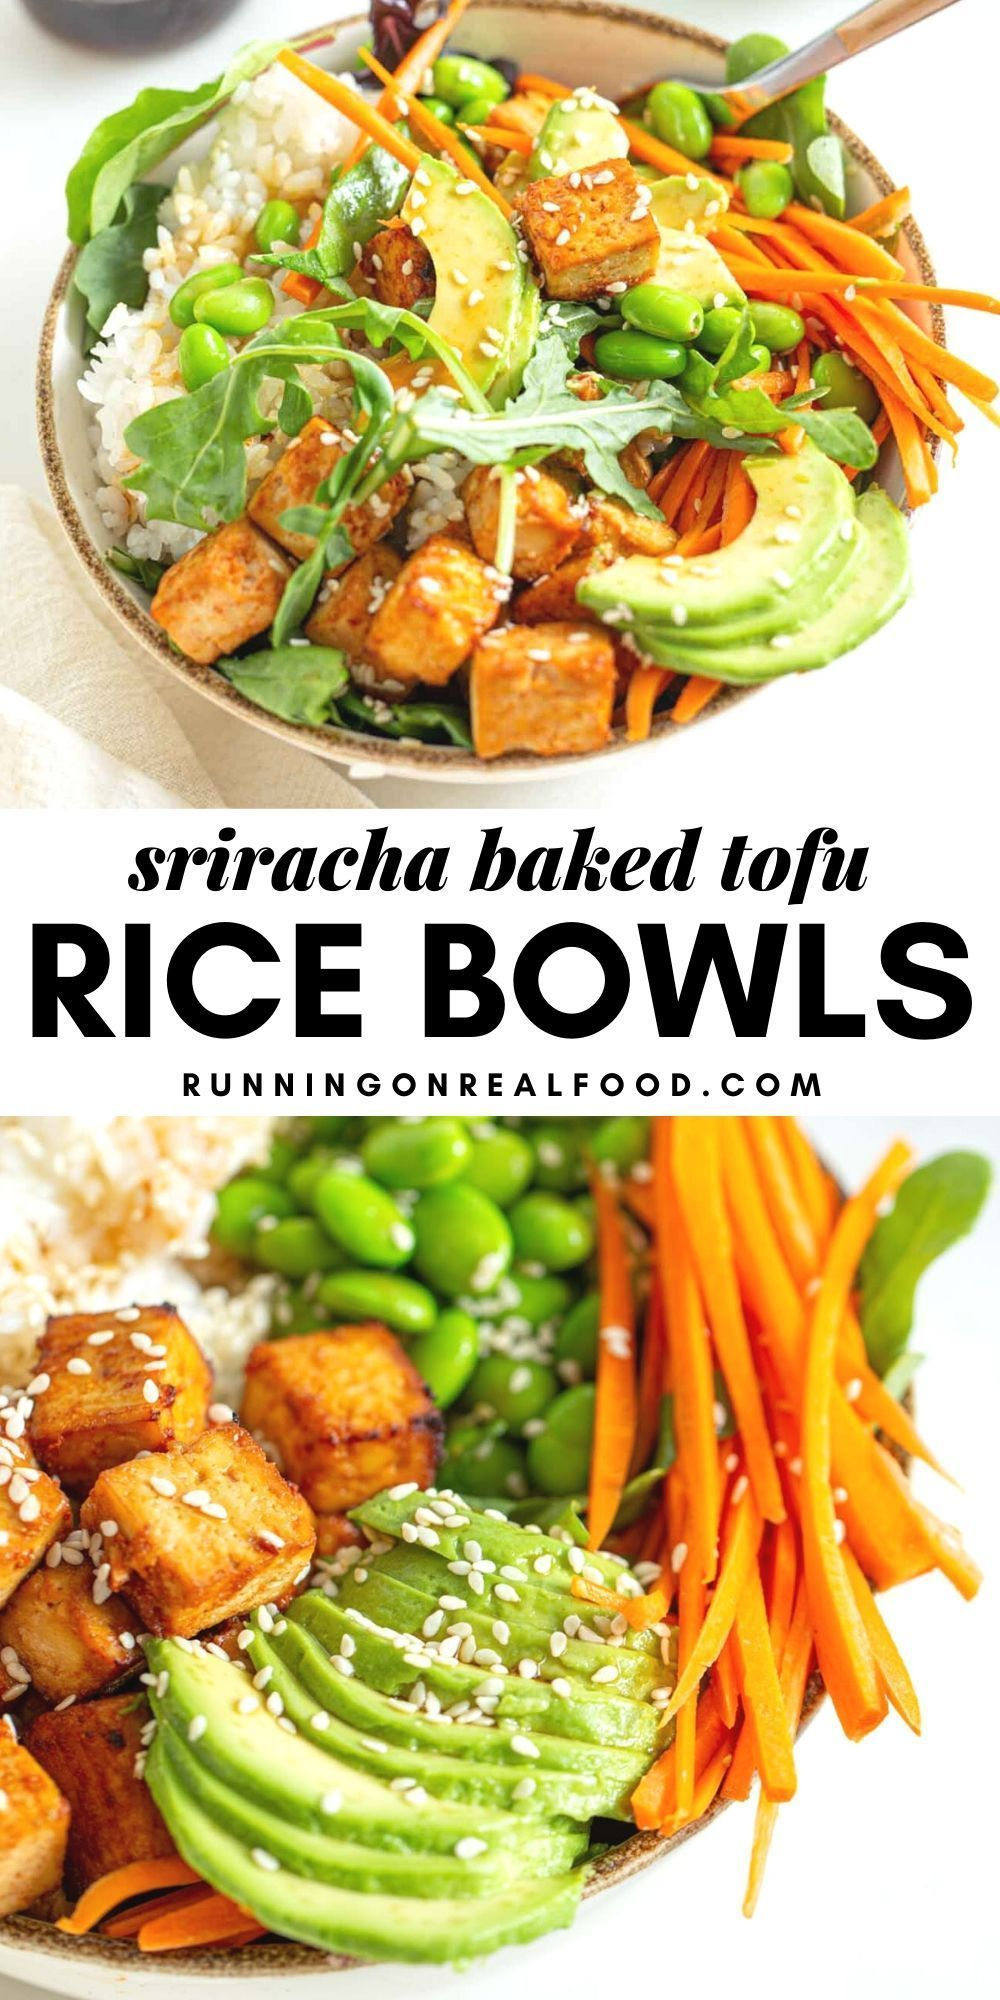 Sriracha Baked Tofu Rice Bowls Recipe In 2020 Baked Tofu Vegan Lunch Recipes Rice Bowls